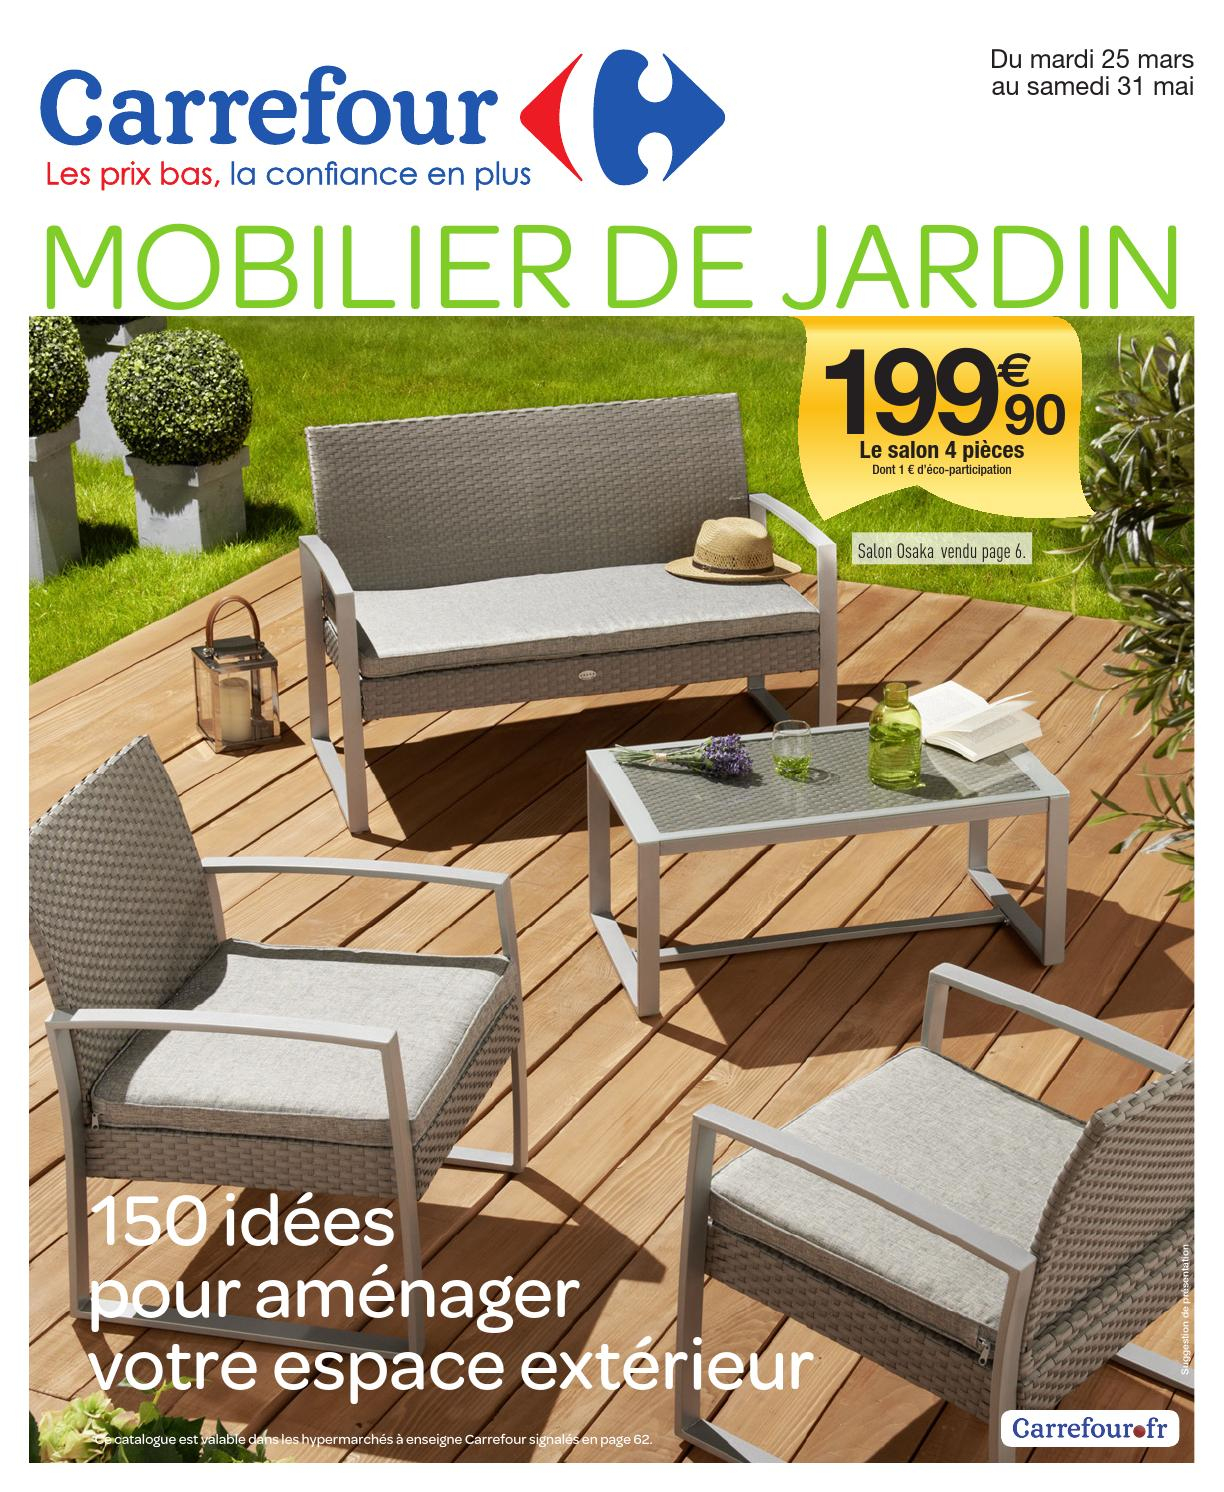 Catalogue Carrefour - 25.03-31.05.2014 By Joe Monroe - Issuu serapportantà Salon De Jardin Leclerc Catalogue